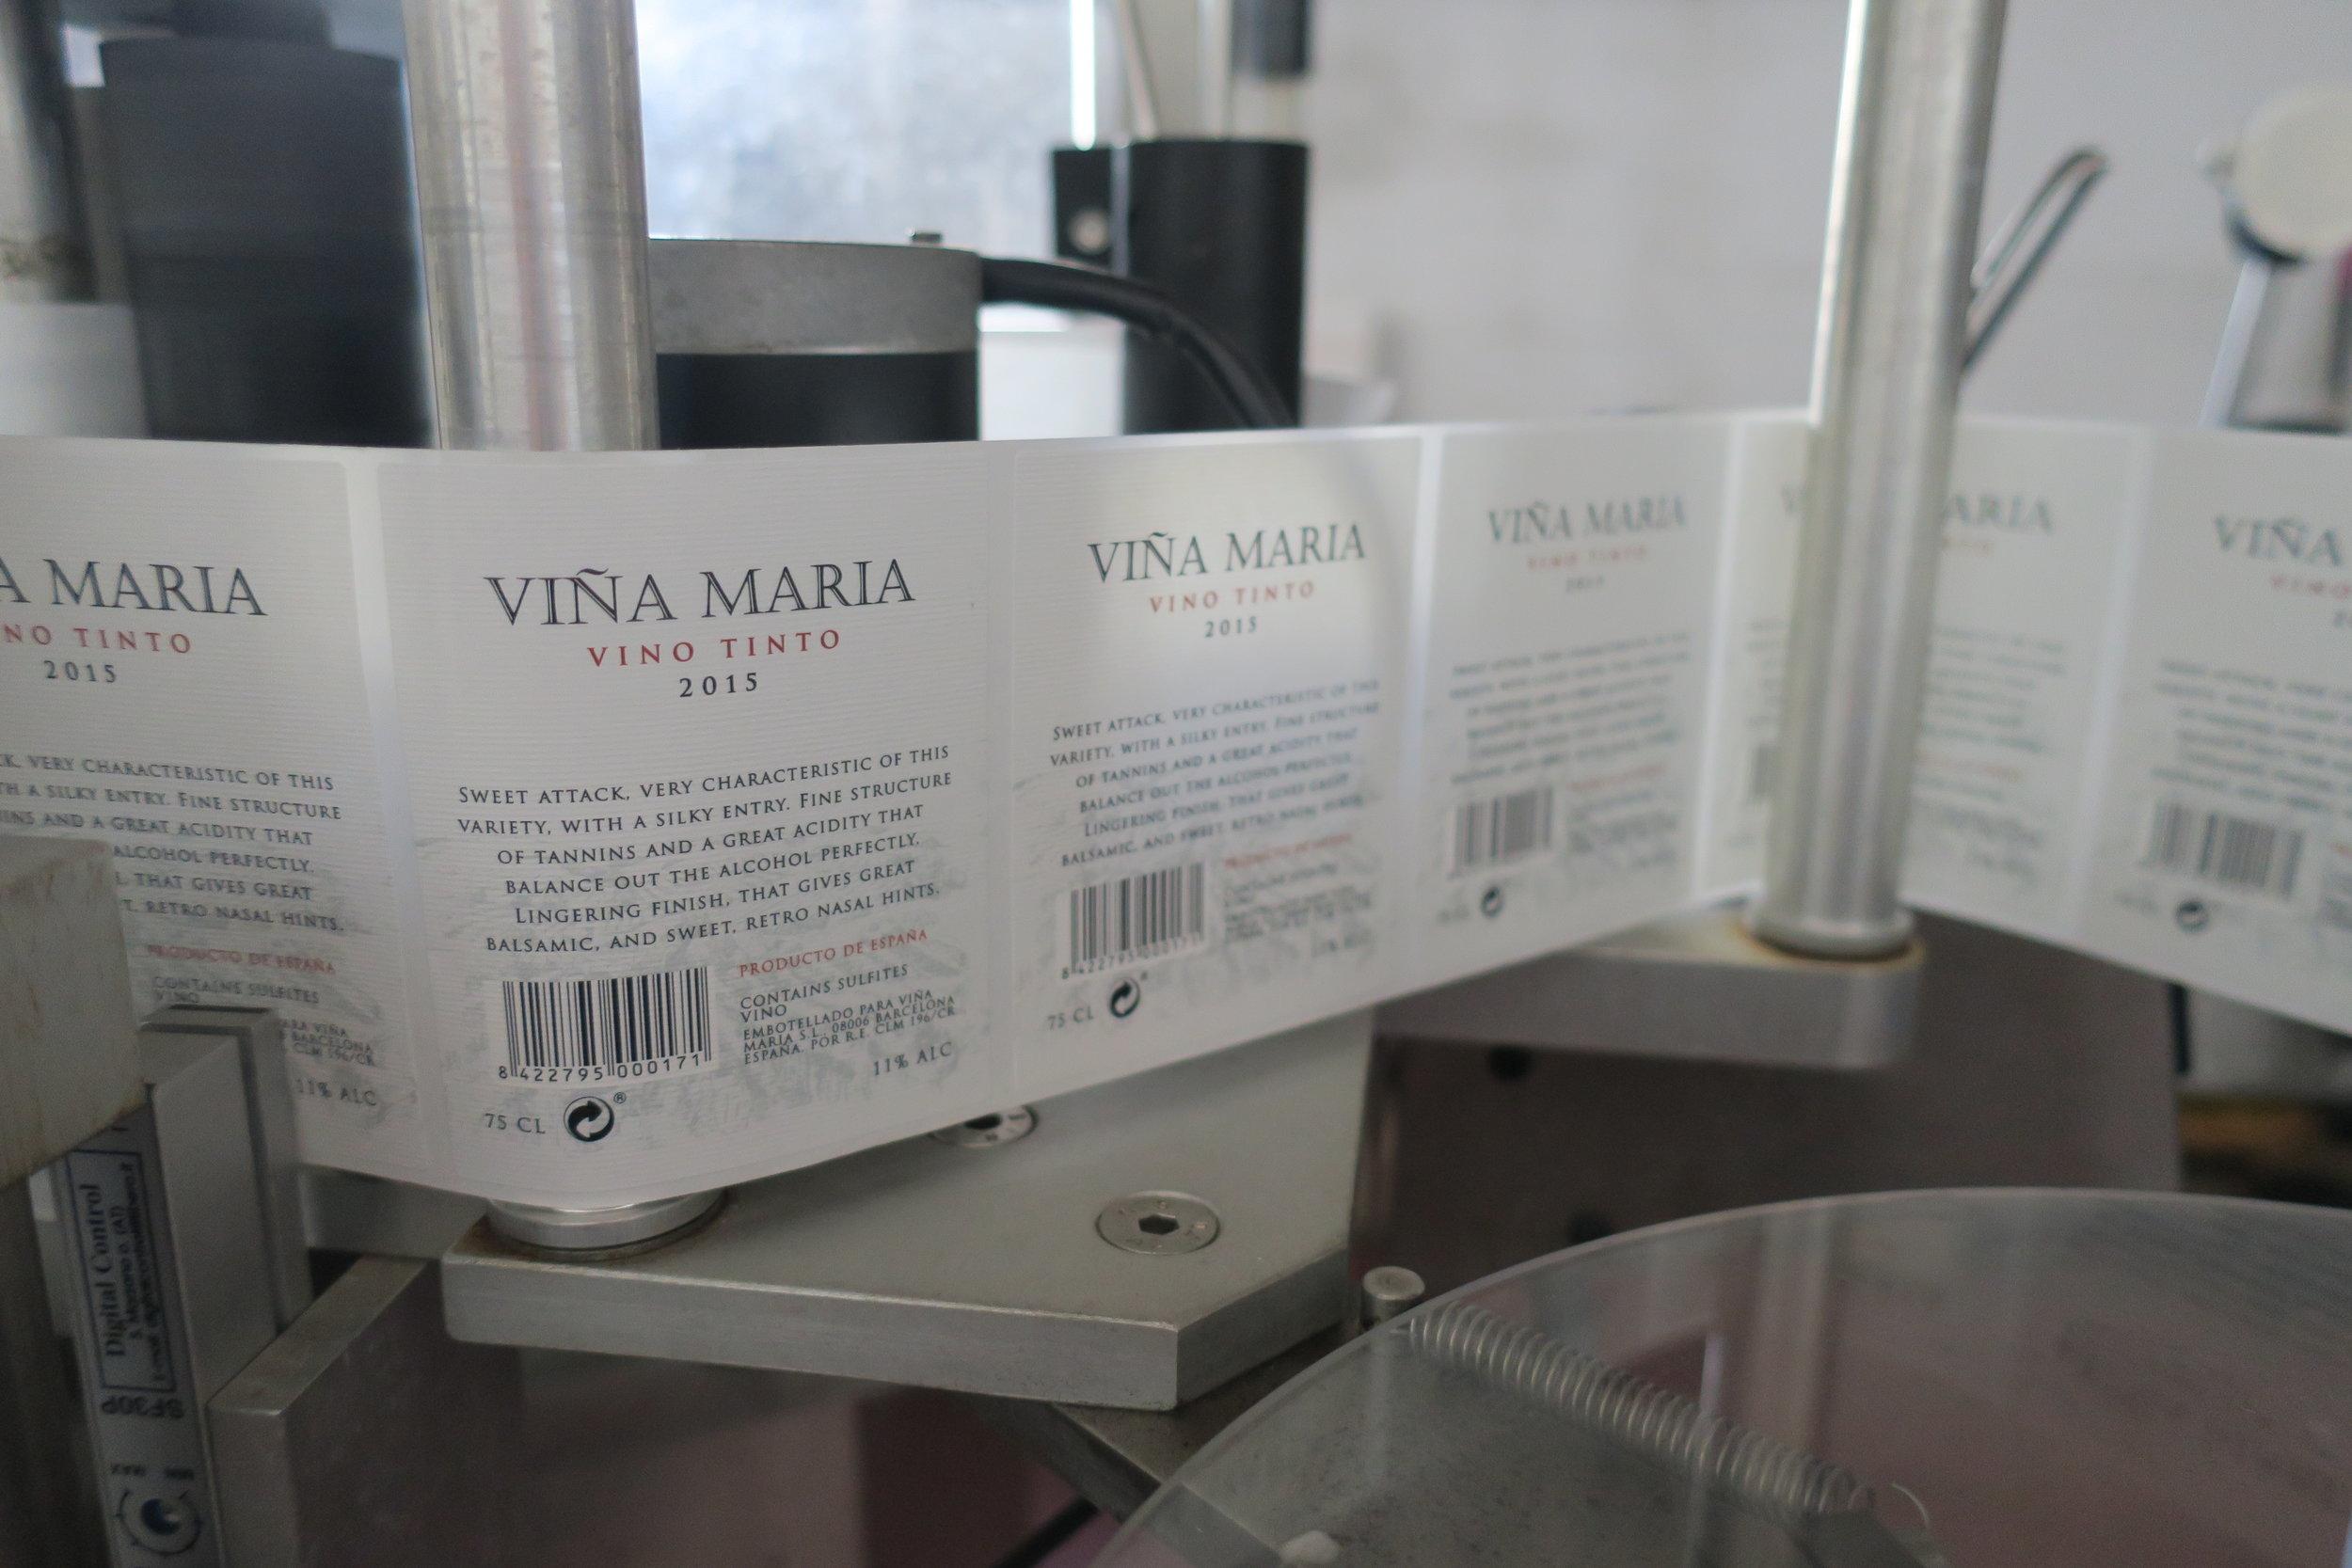 VINA-MARIA-WINERY (7).JPG